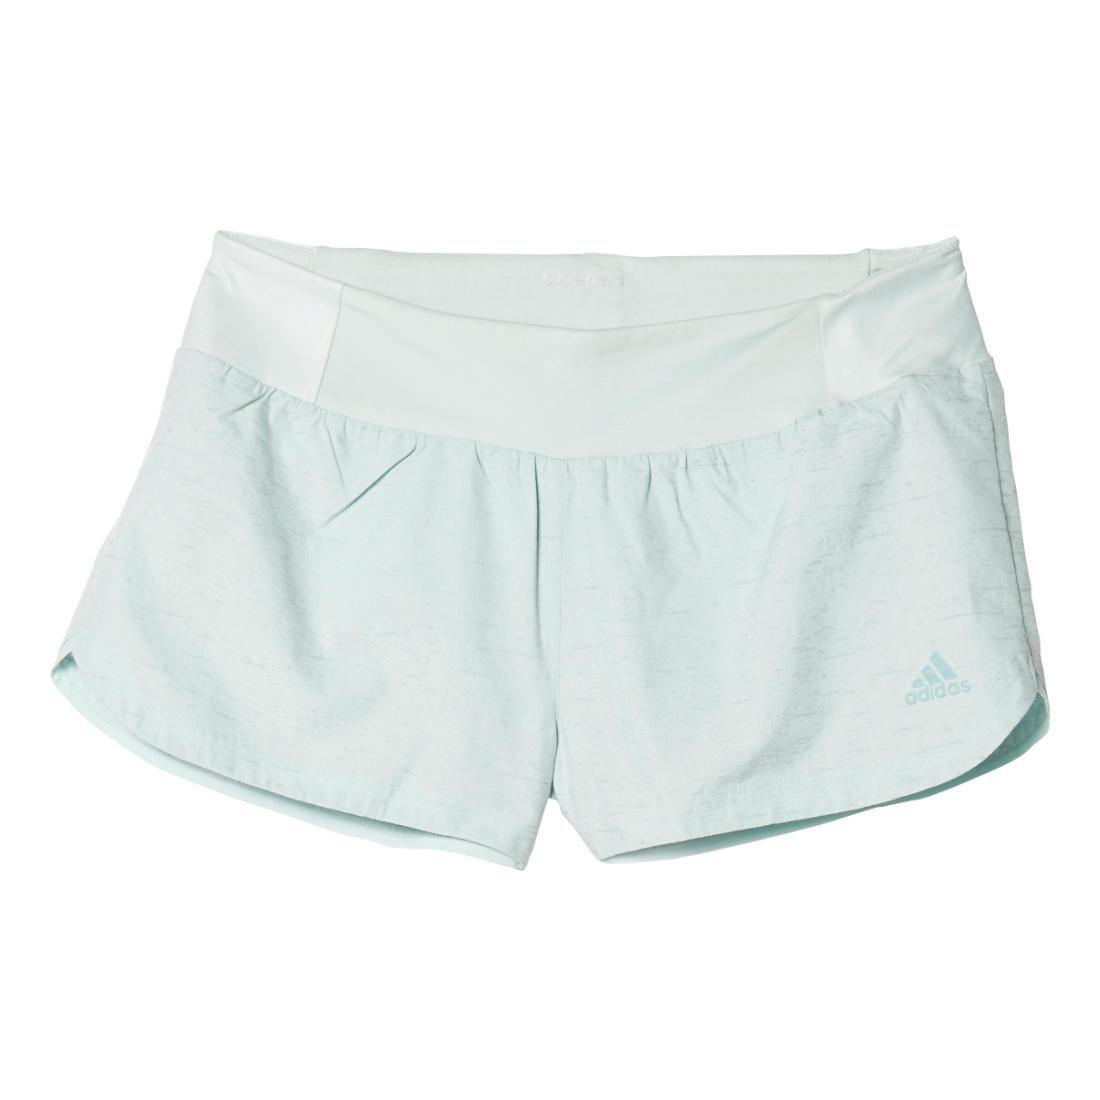 e03300c2a16a Amazon.com   adidas Women s Running Supernova Glide Shorts   Sports    Outdoors